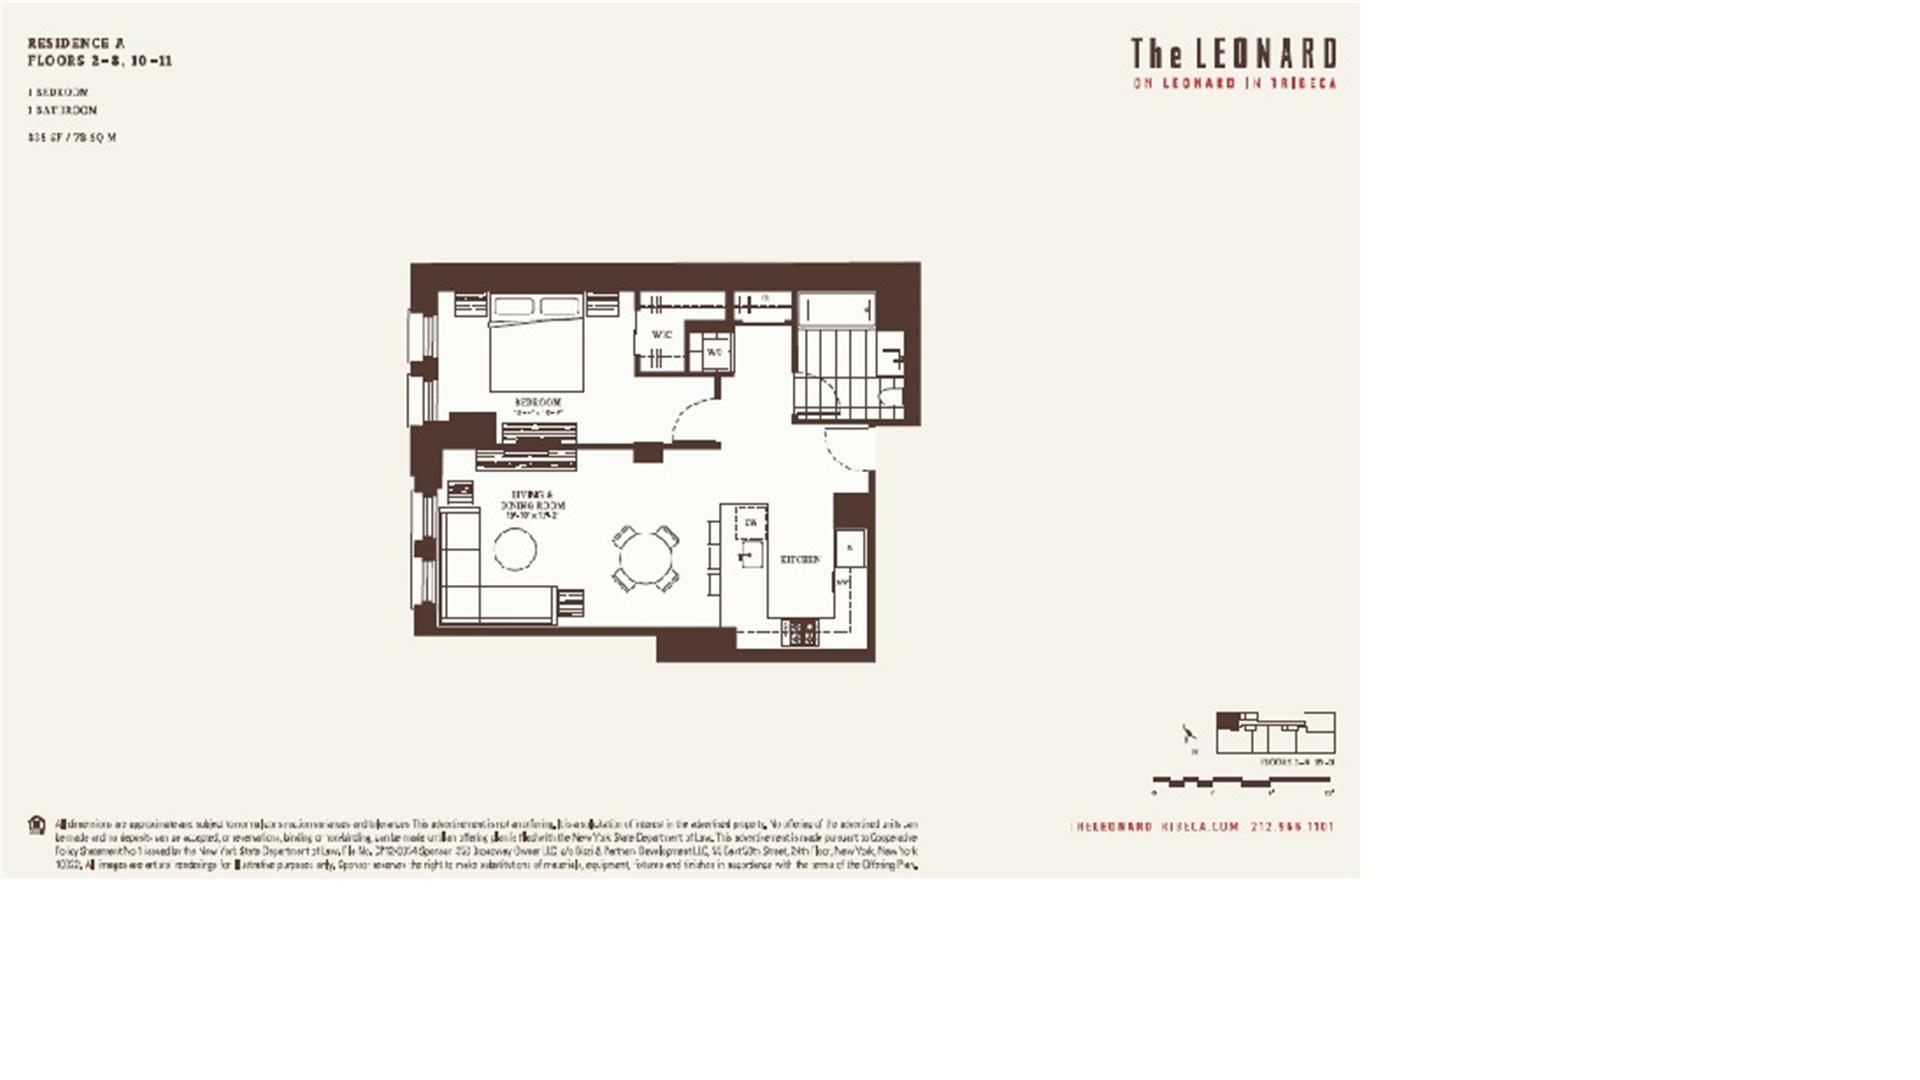 Floor plan of 101 Leonard St, 3A - TriBeCa, New York